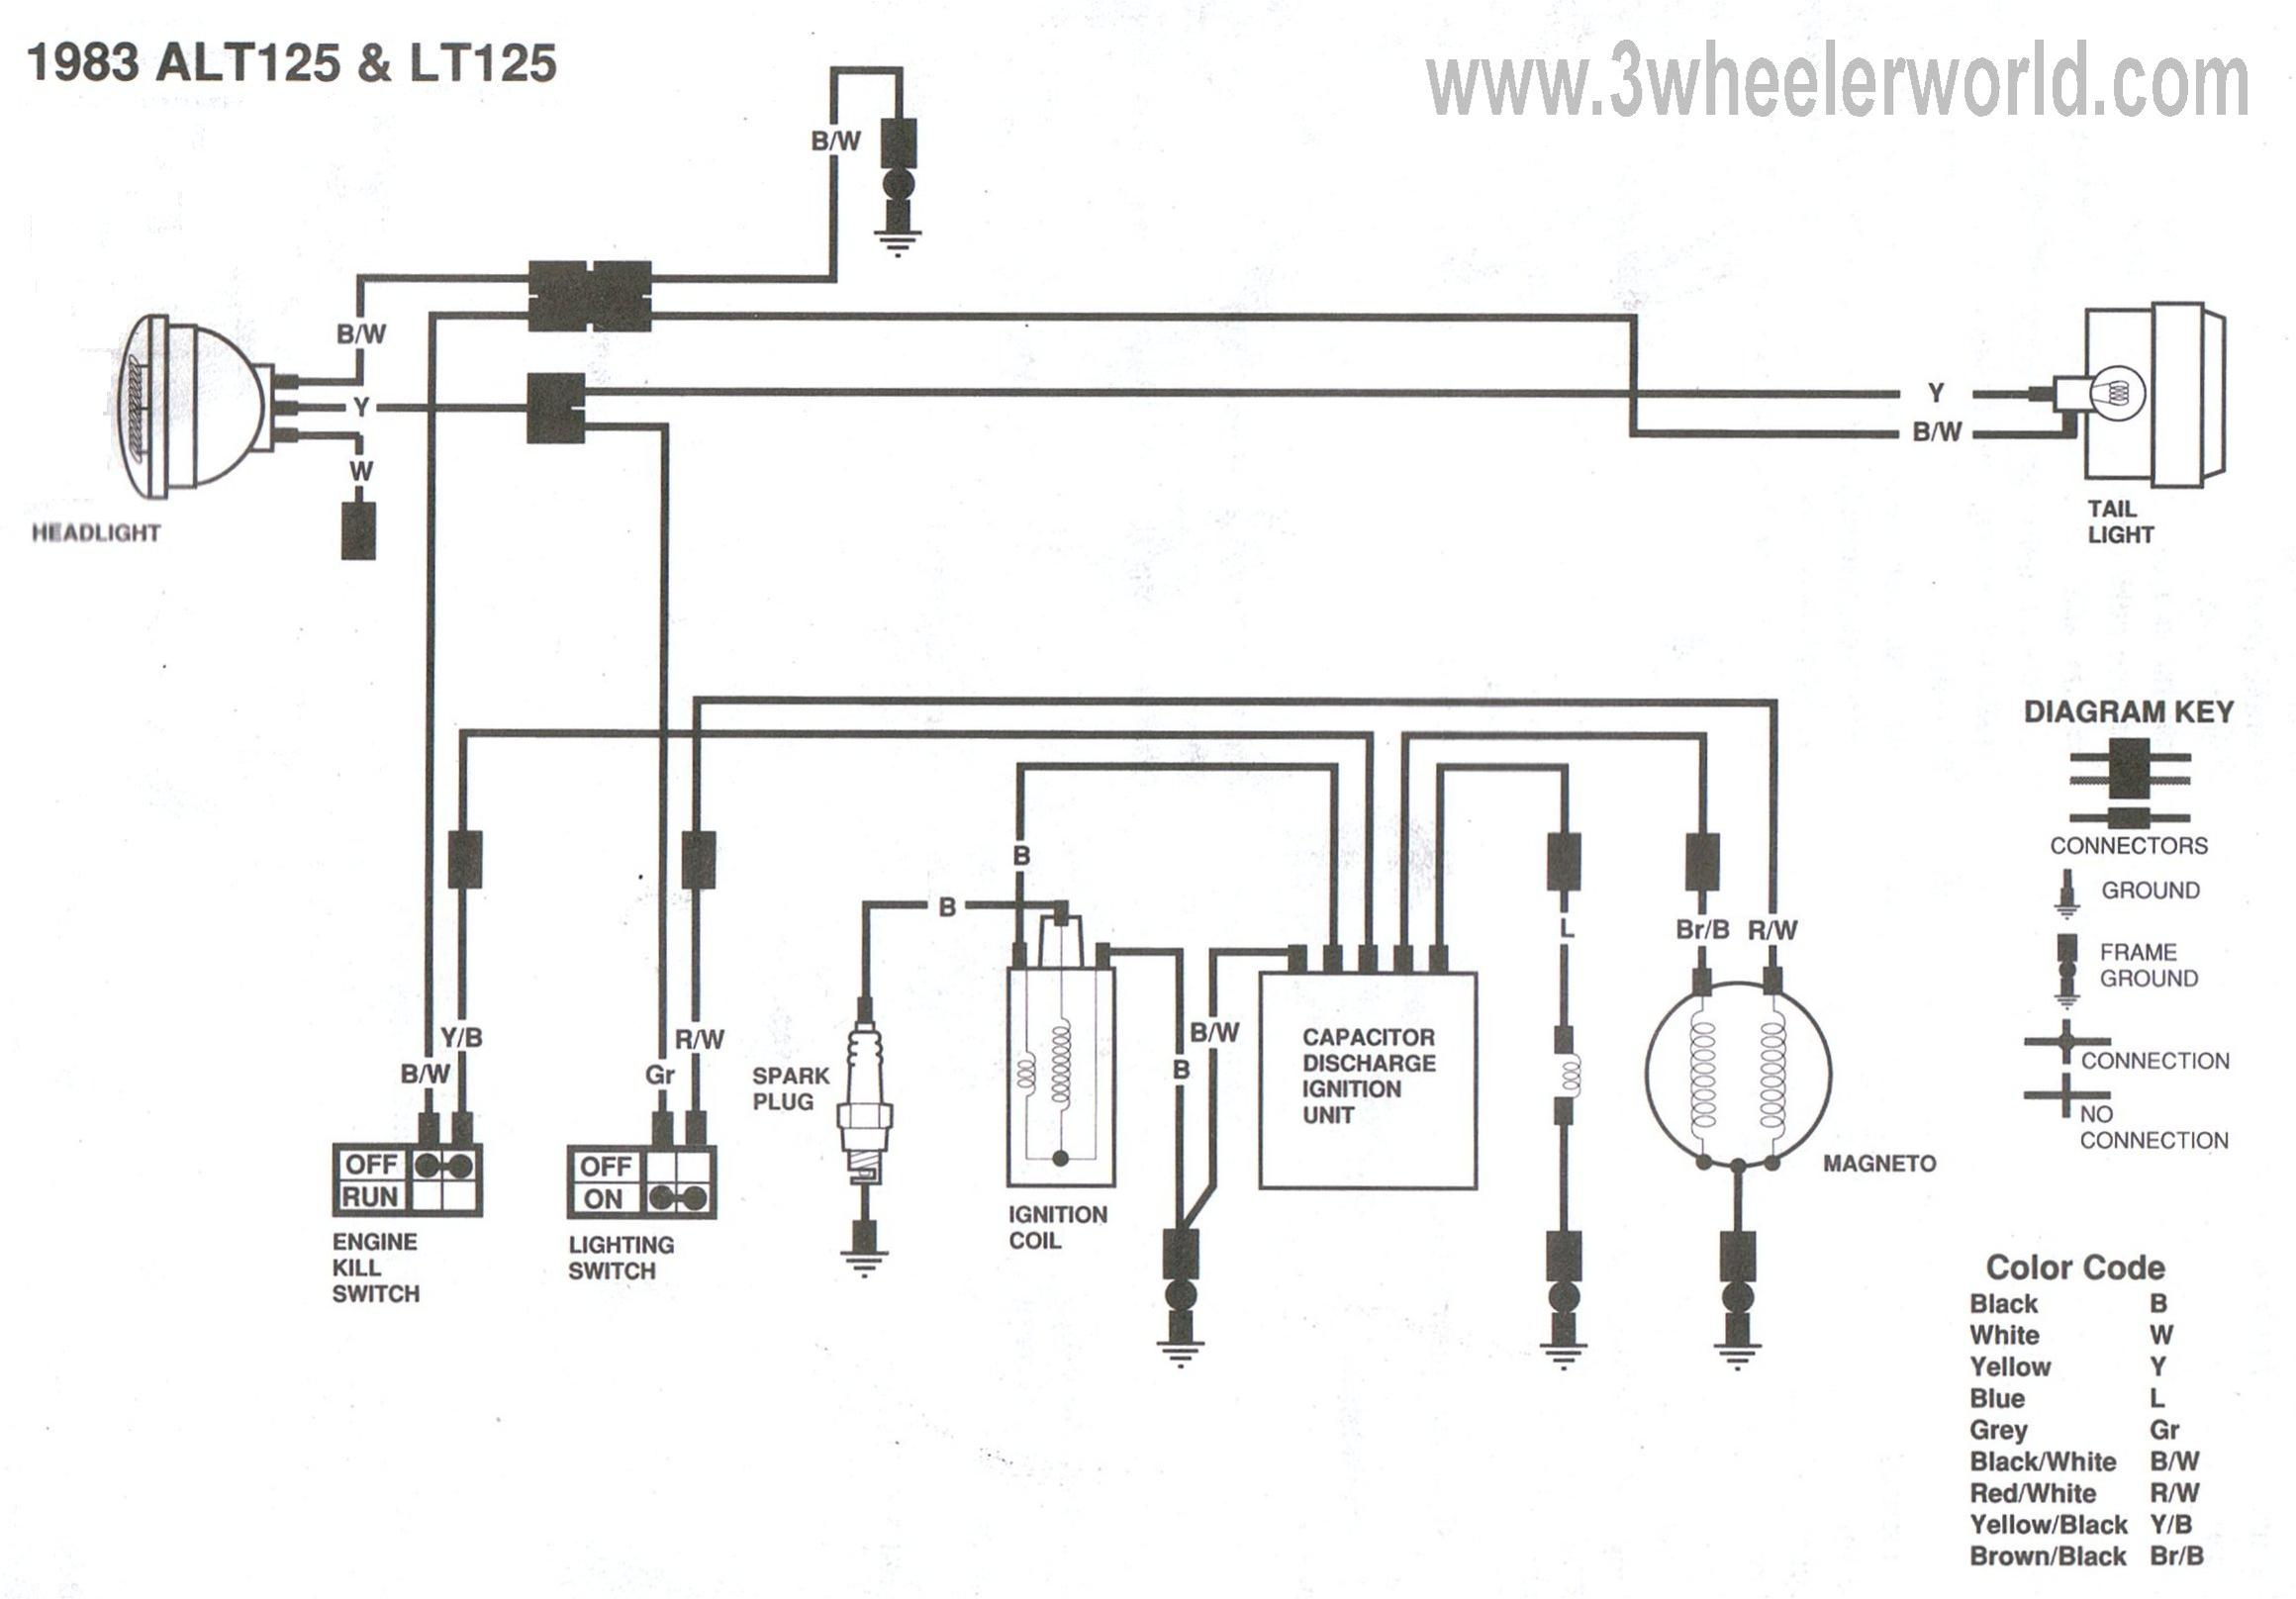 Glamorous suzuki gs 125 wiring diagram photos best image wire famous suzuki gt750 wiring diagram contemporary electrical system publicscrutiny Choice Image